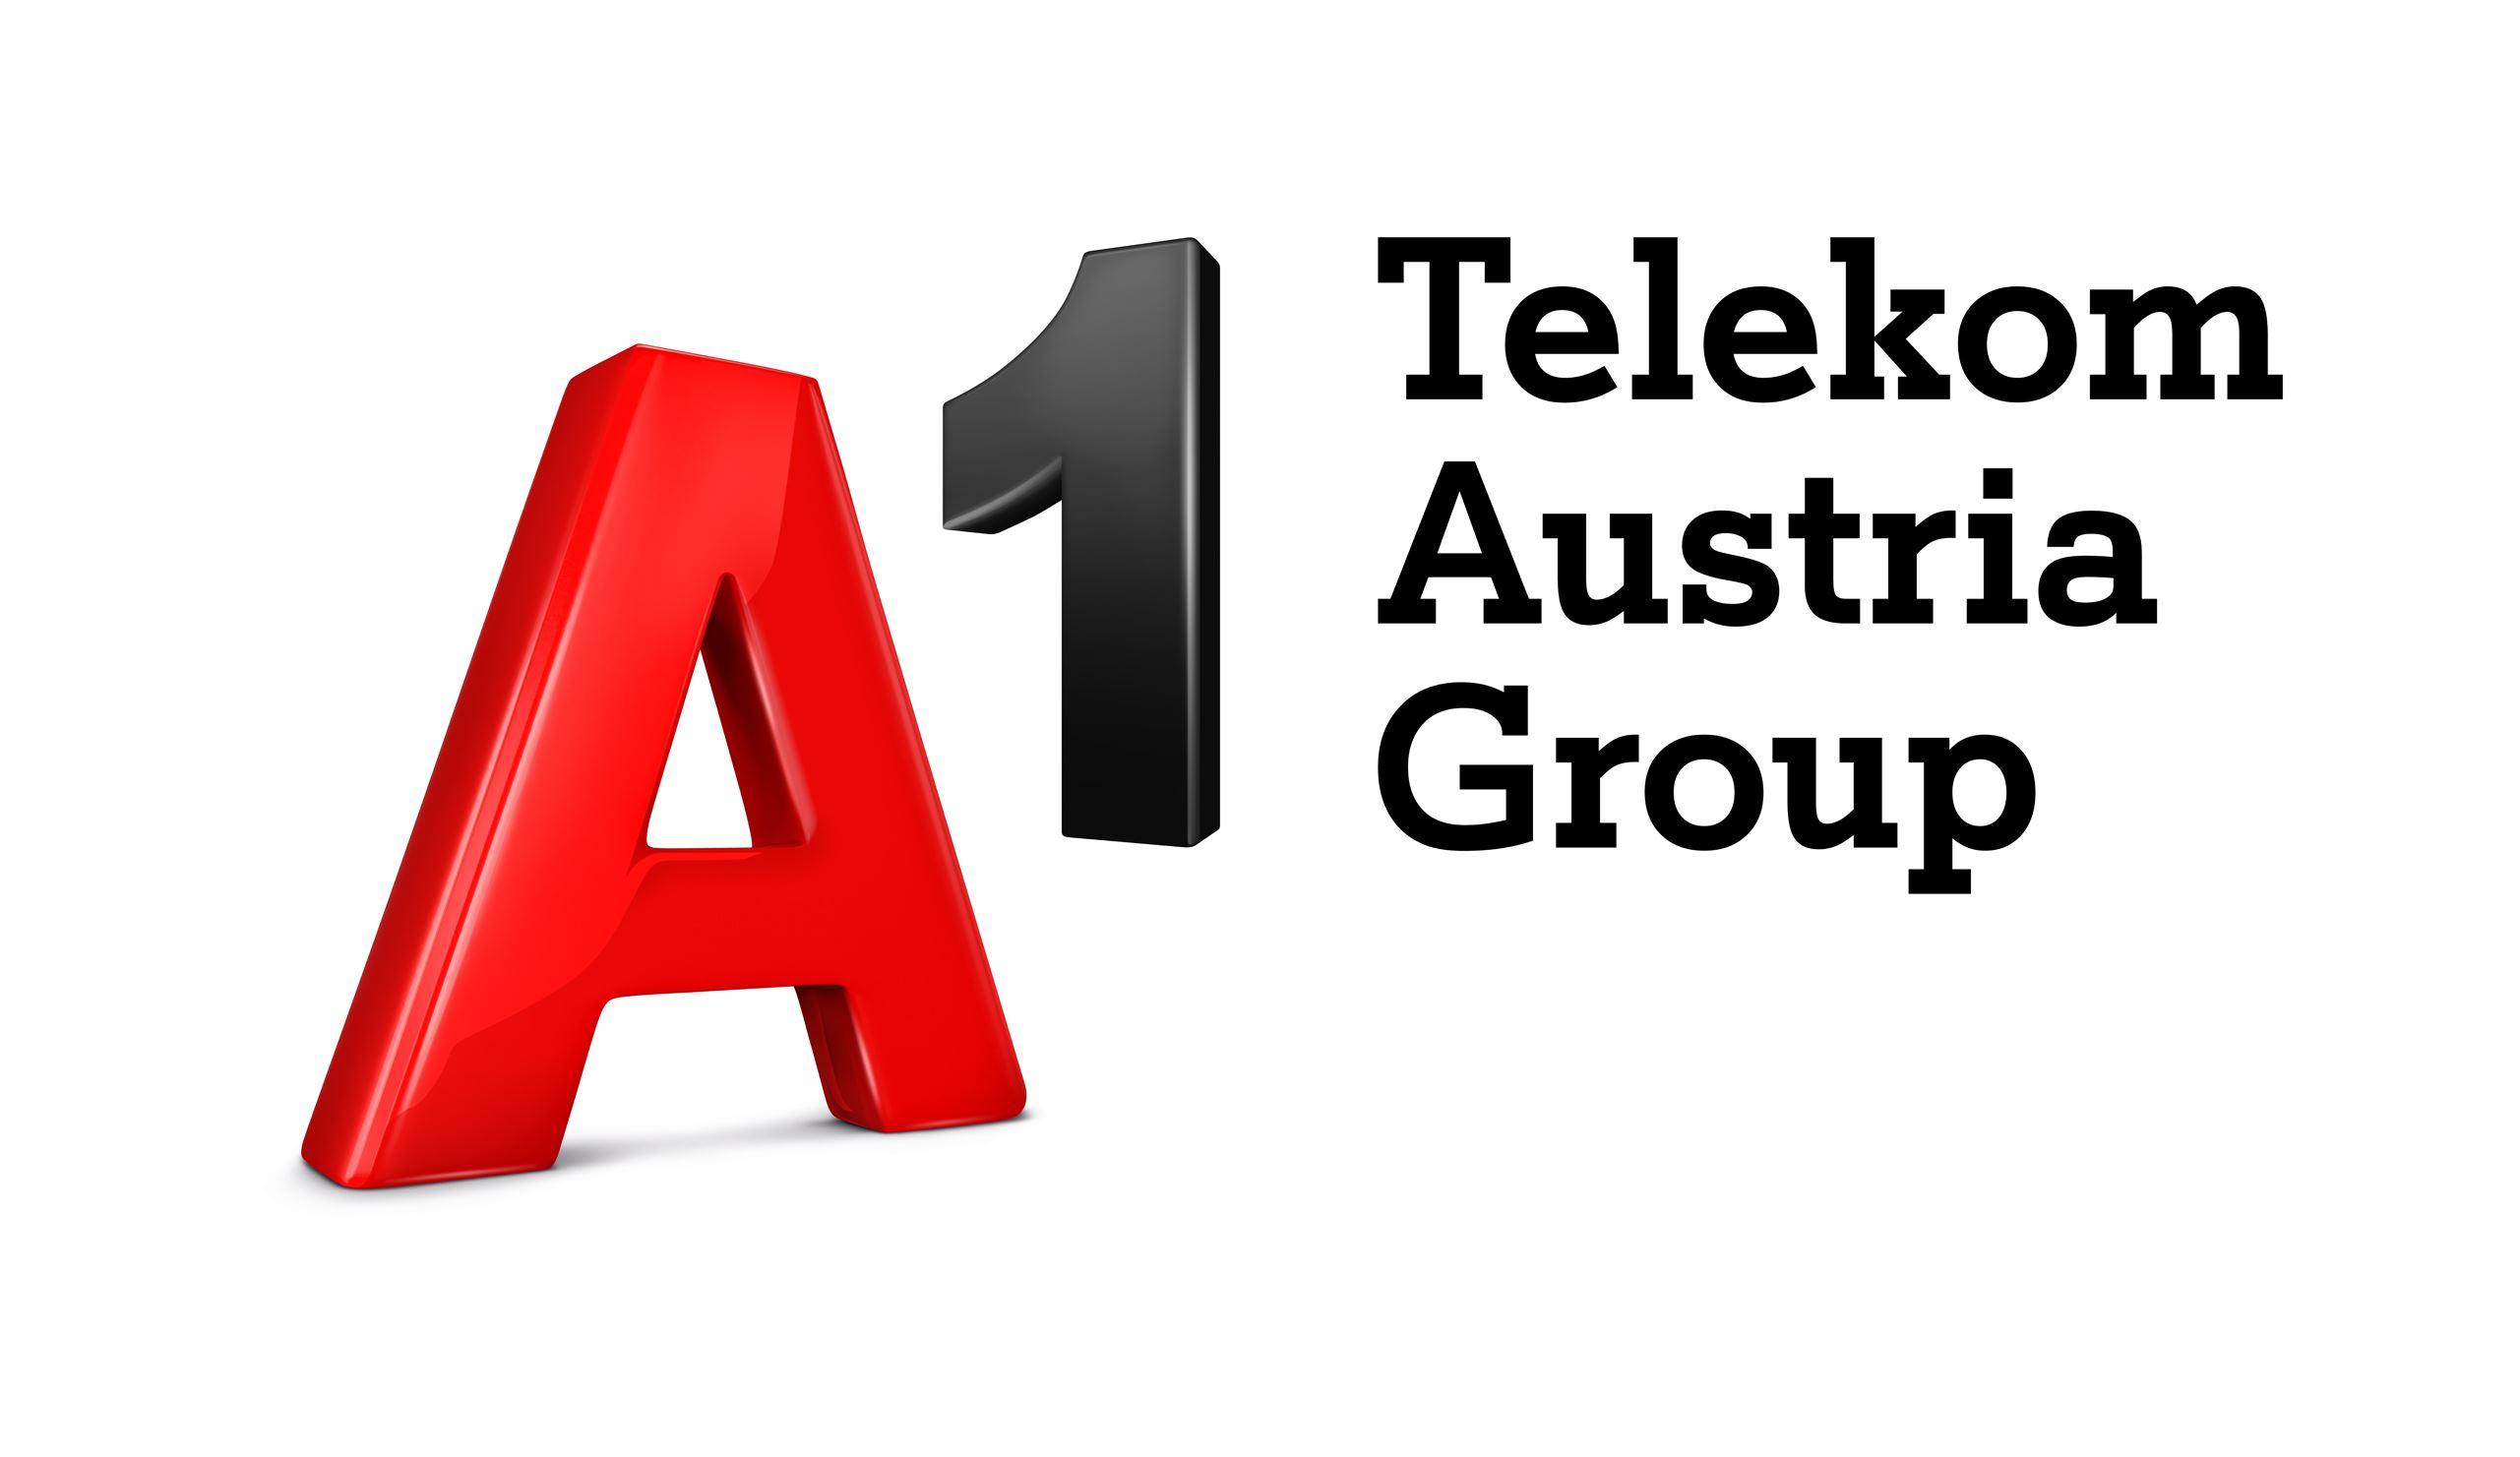 A1 Telekom Austria Group Wikipedia